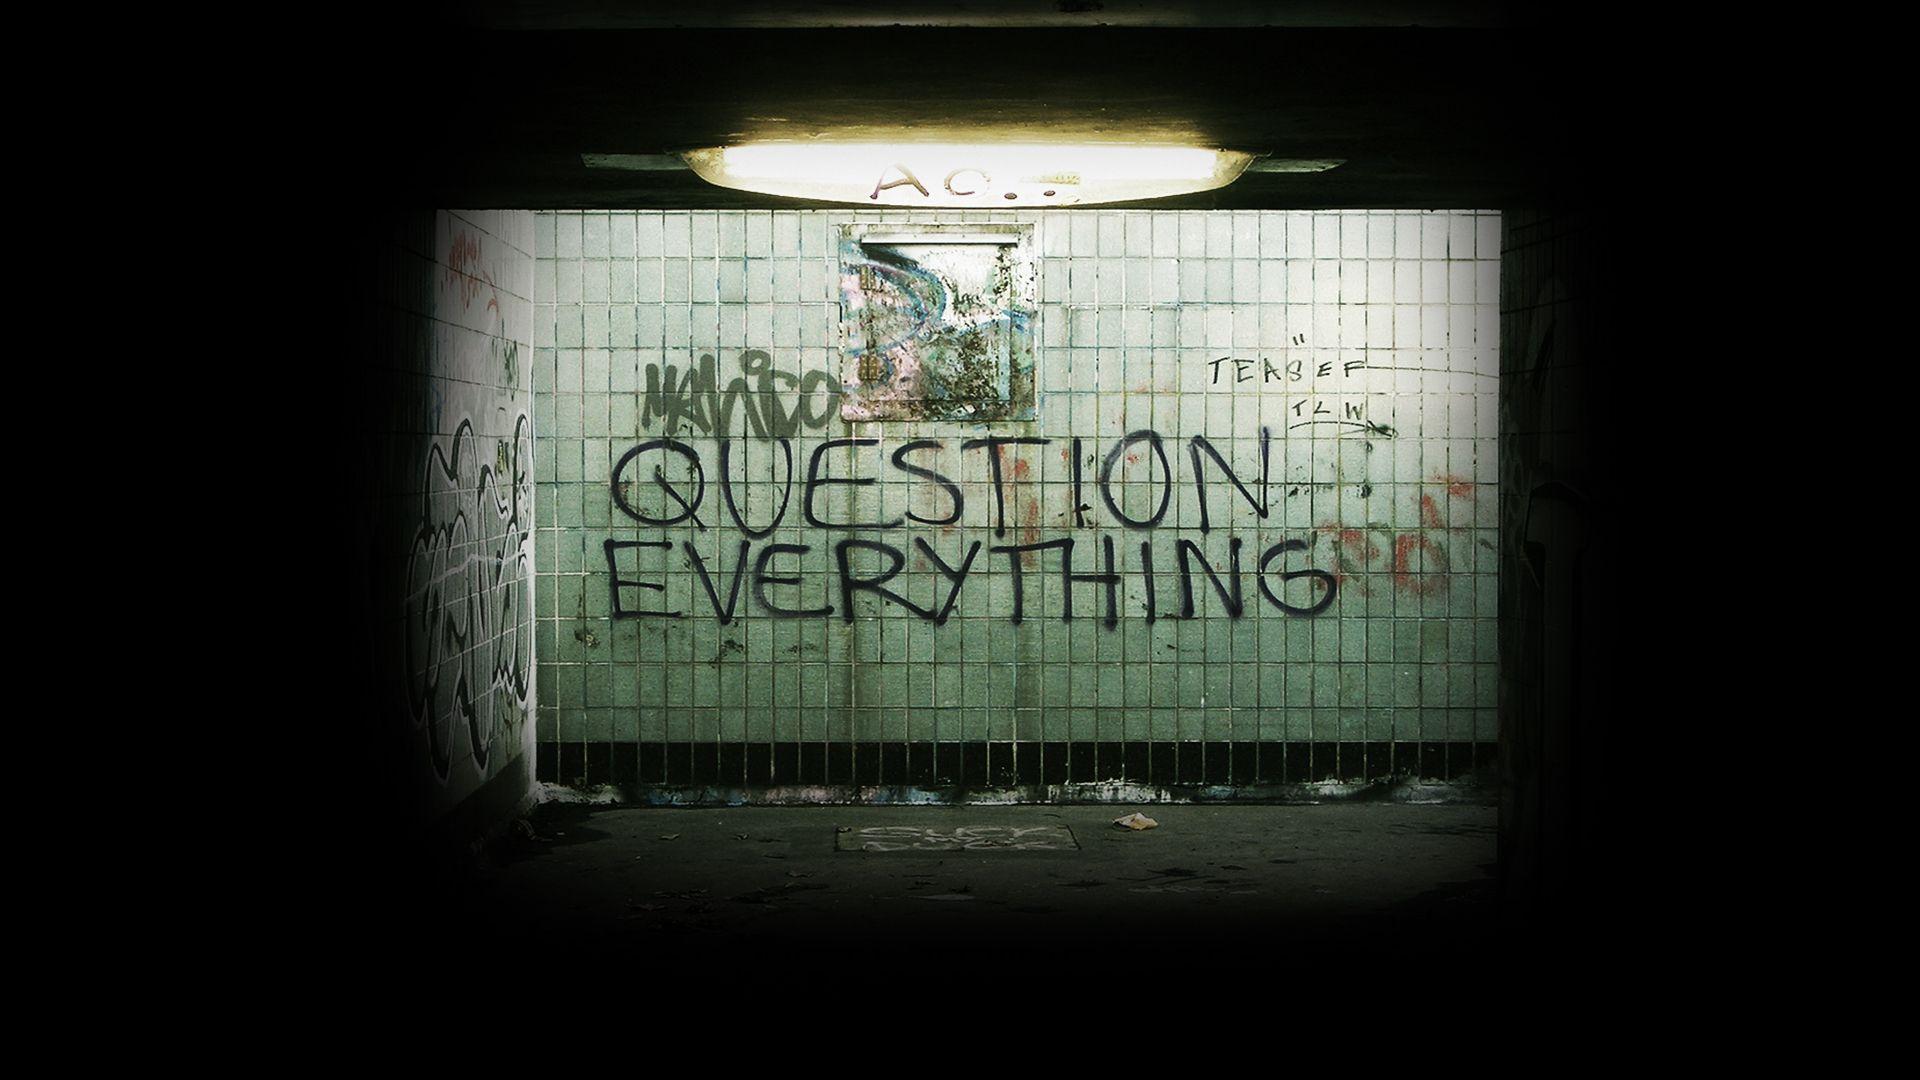 Wallpapers Bansky Graffiti Banksy Street Art 1920x1080